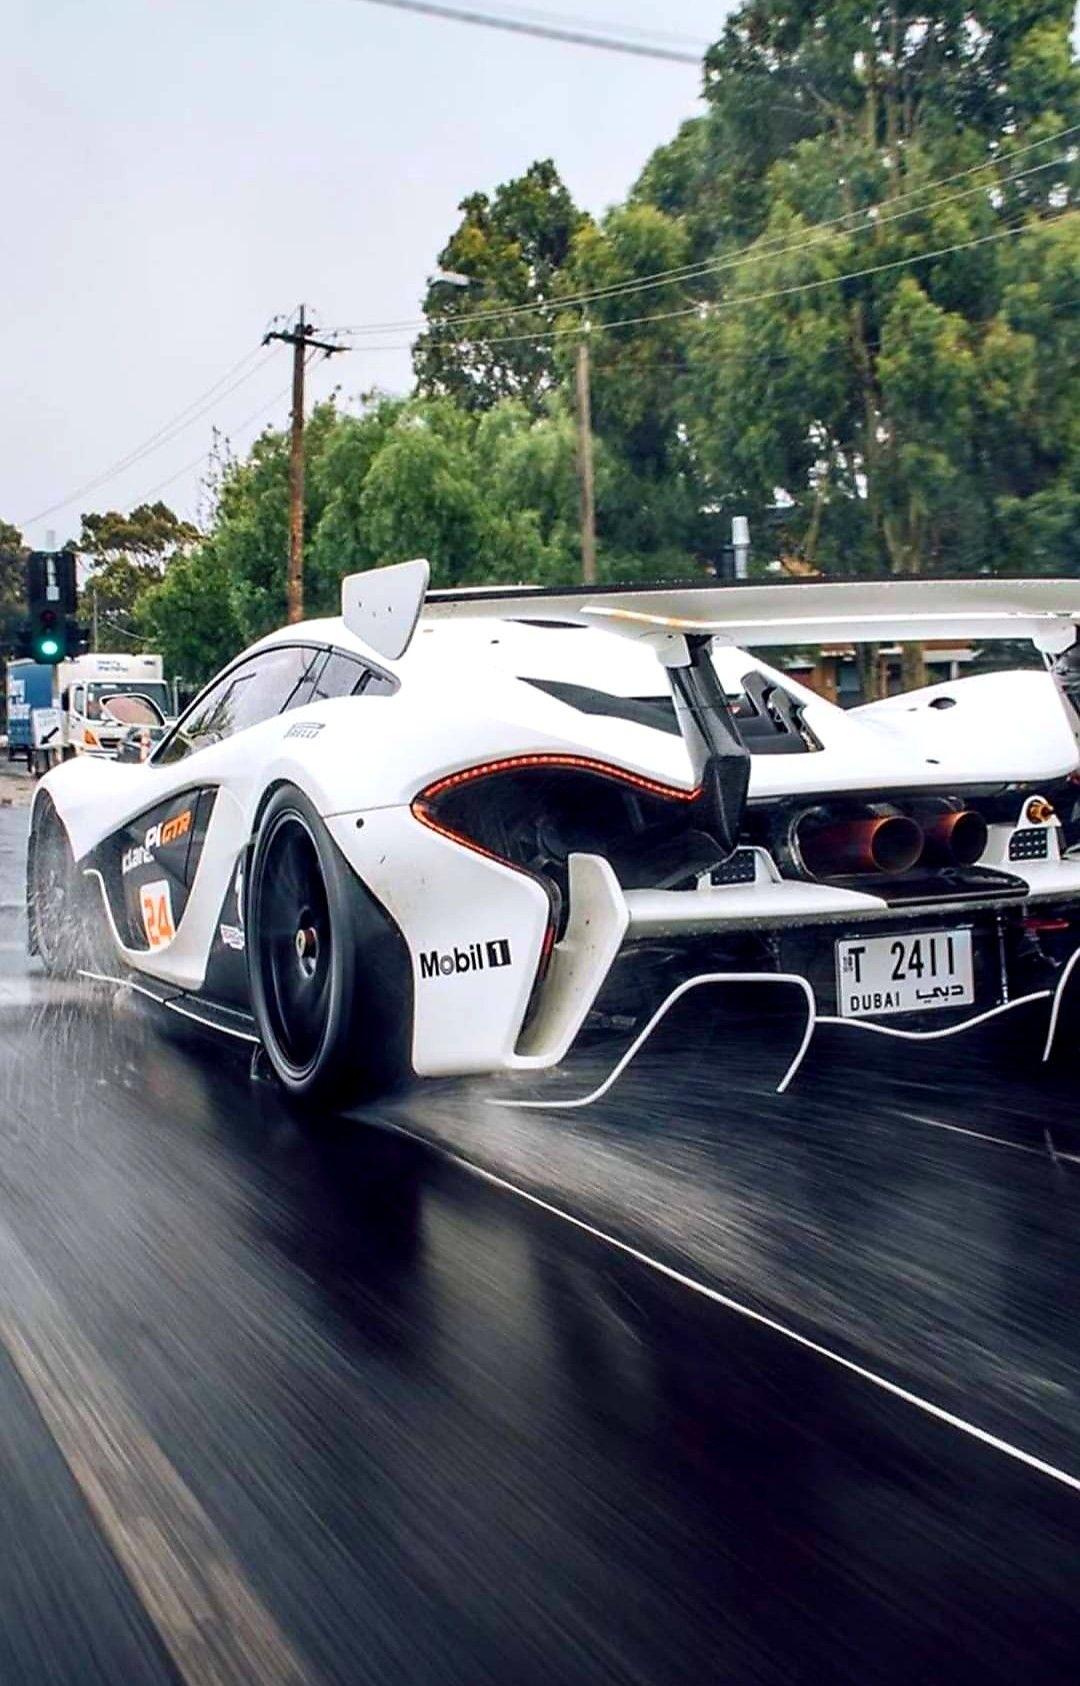 Pin By Daniel Ramirez On Luxusautok In 2020 Sports Cars Luxury Super Cars Lamborghini Cars